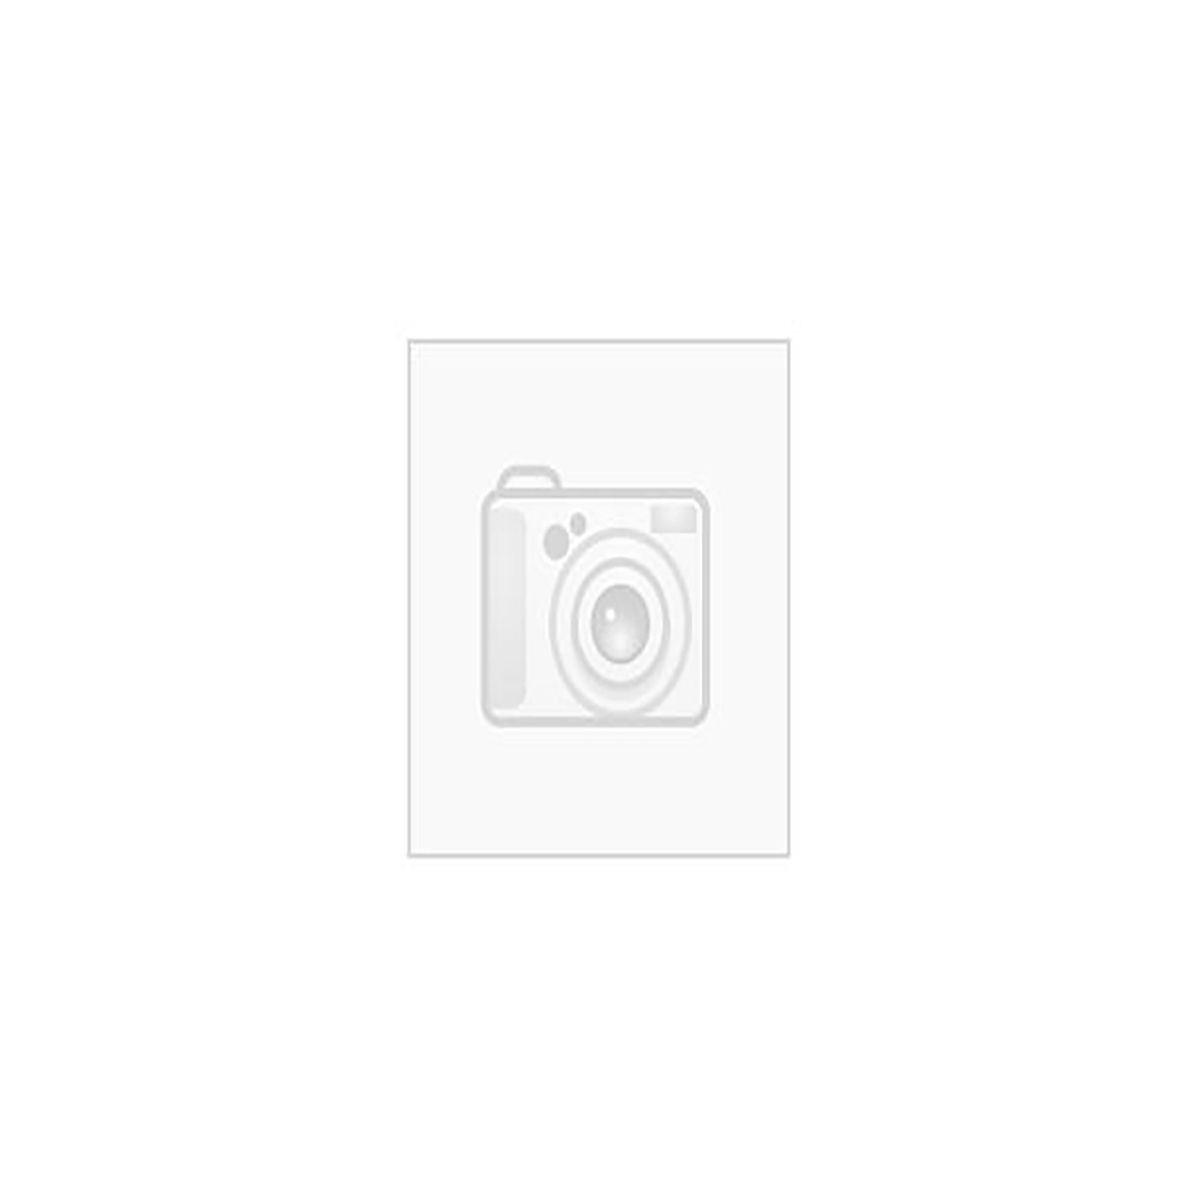 Olympia, Metamorfosi oval, rektangulær eller formløs servant